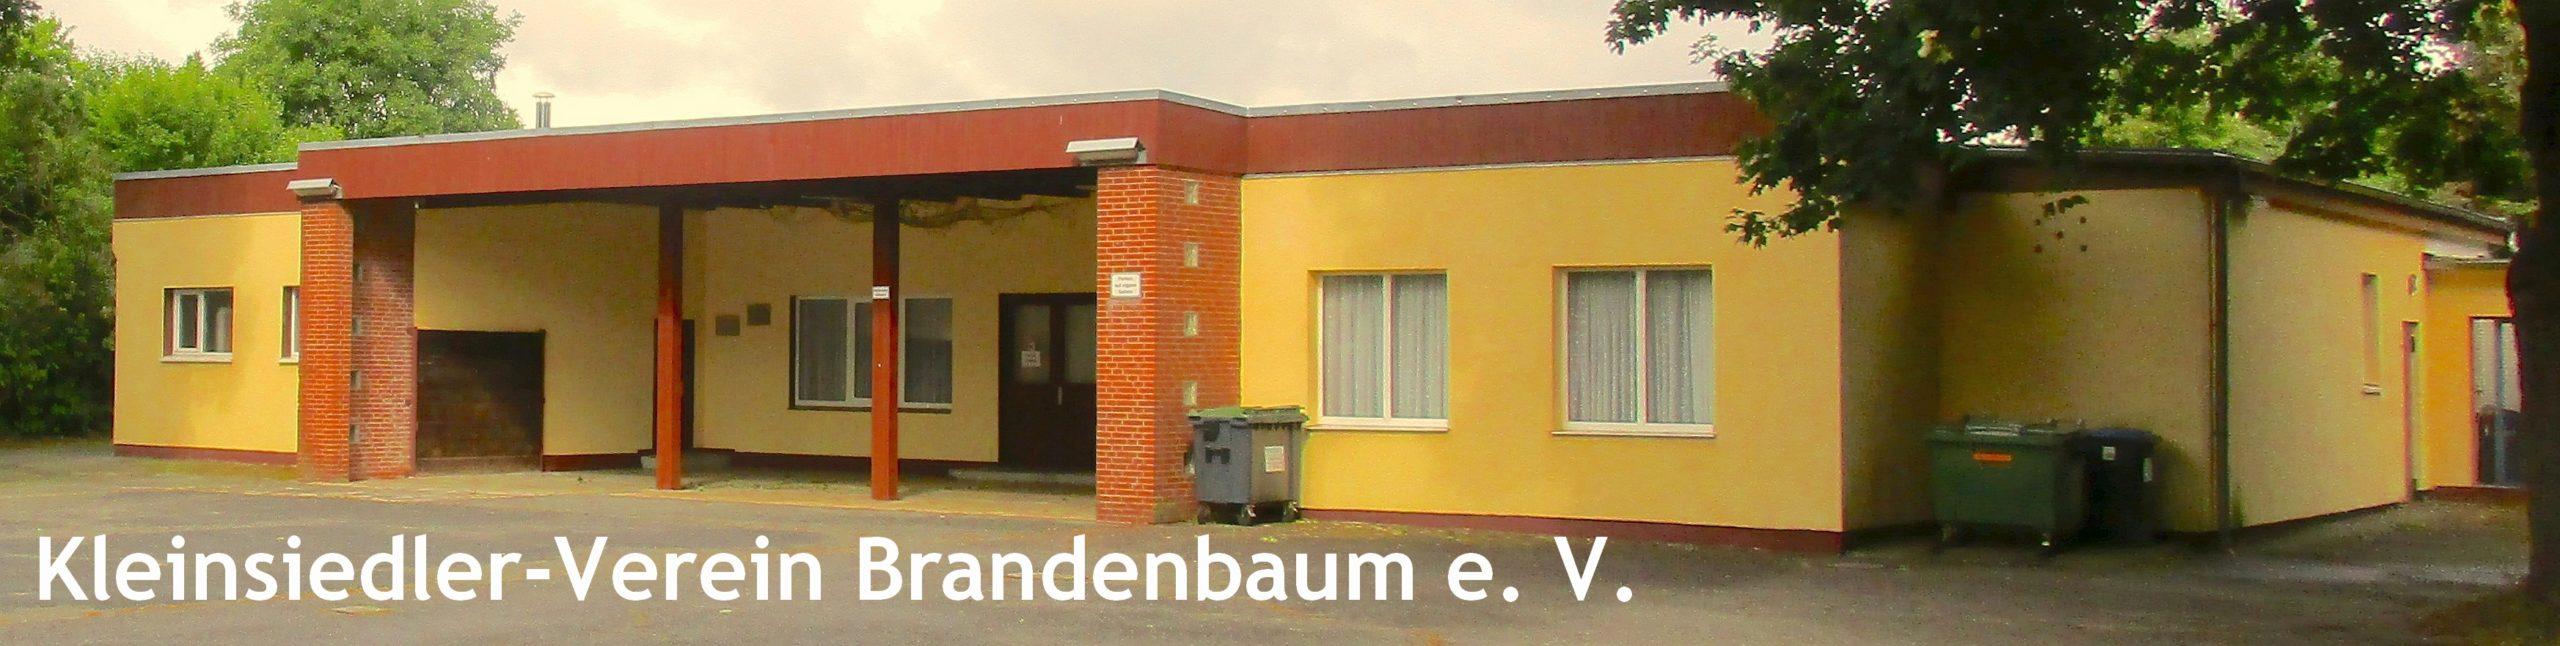 Kleinsiedlerverein Brandenbaum Logo